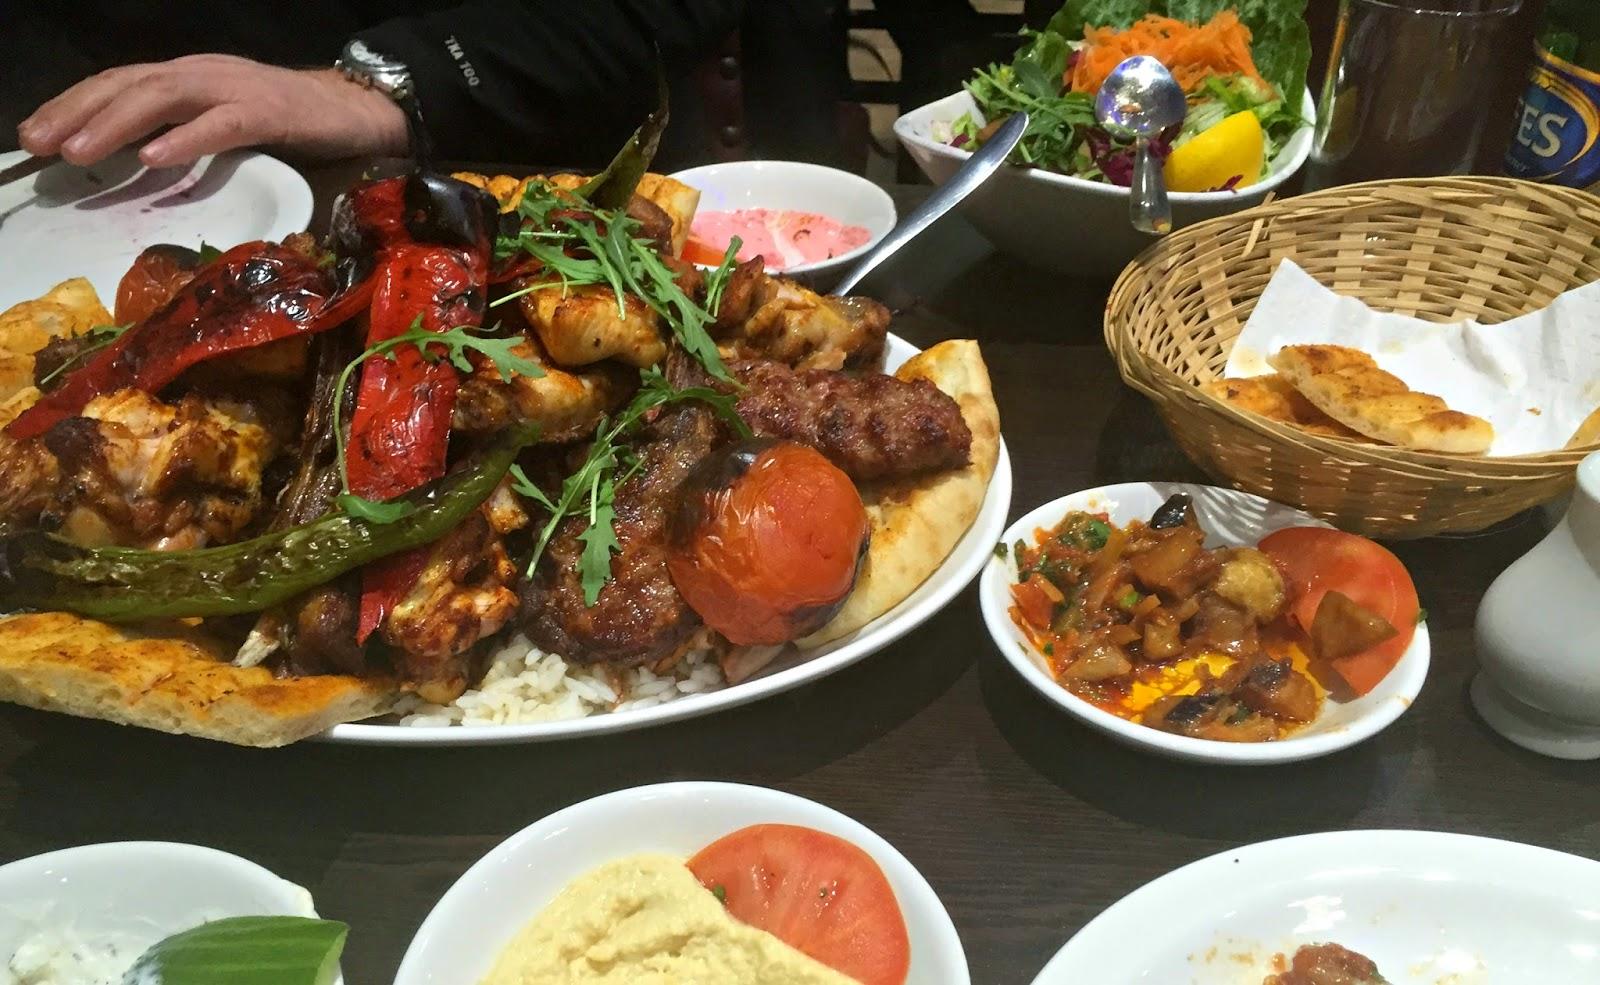 Platter of kebab and pitta